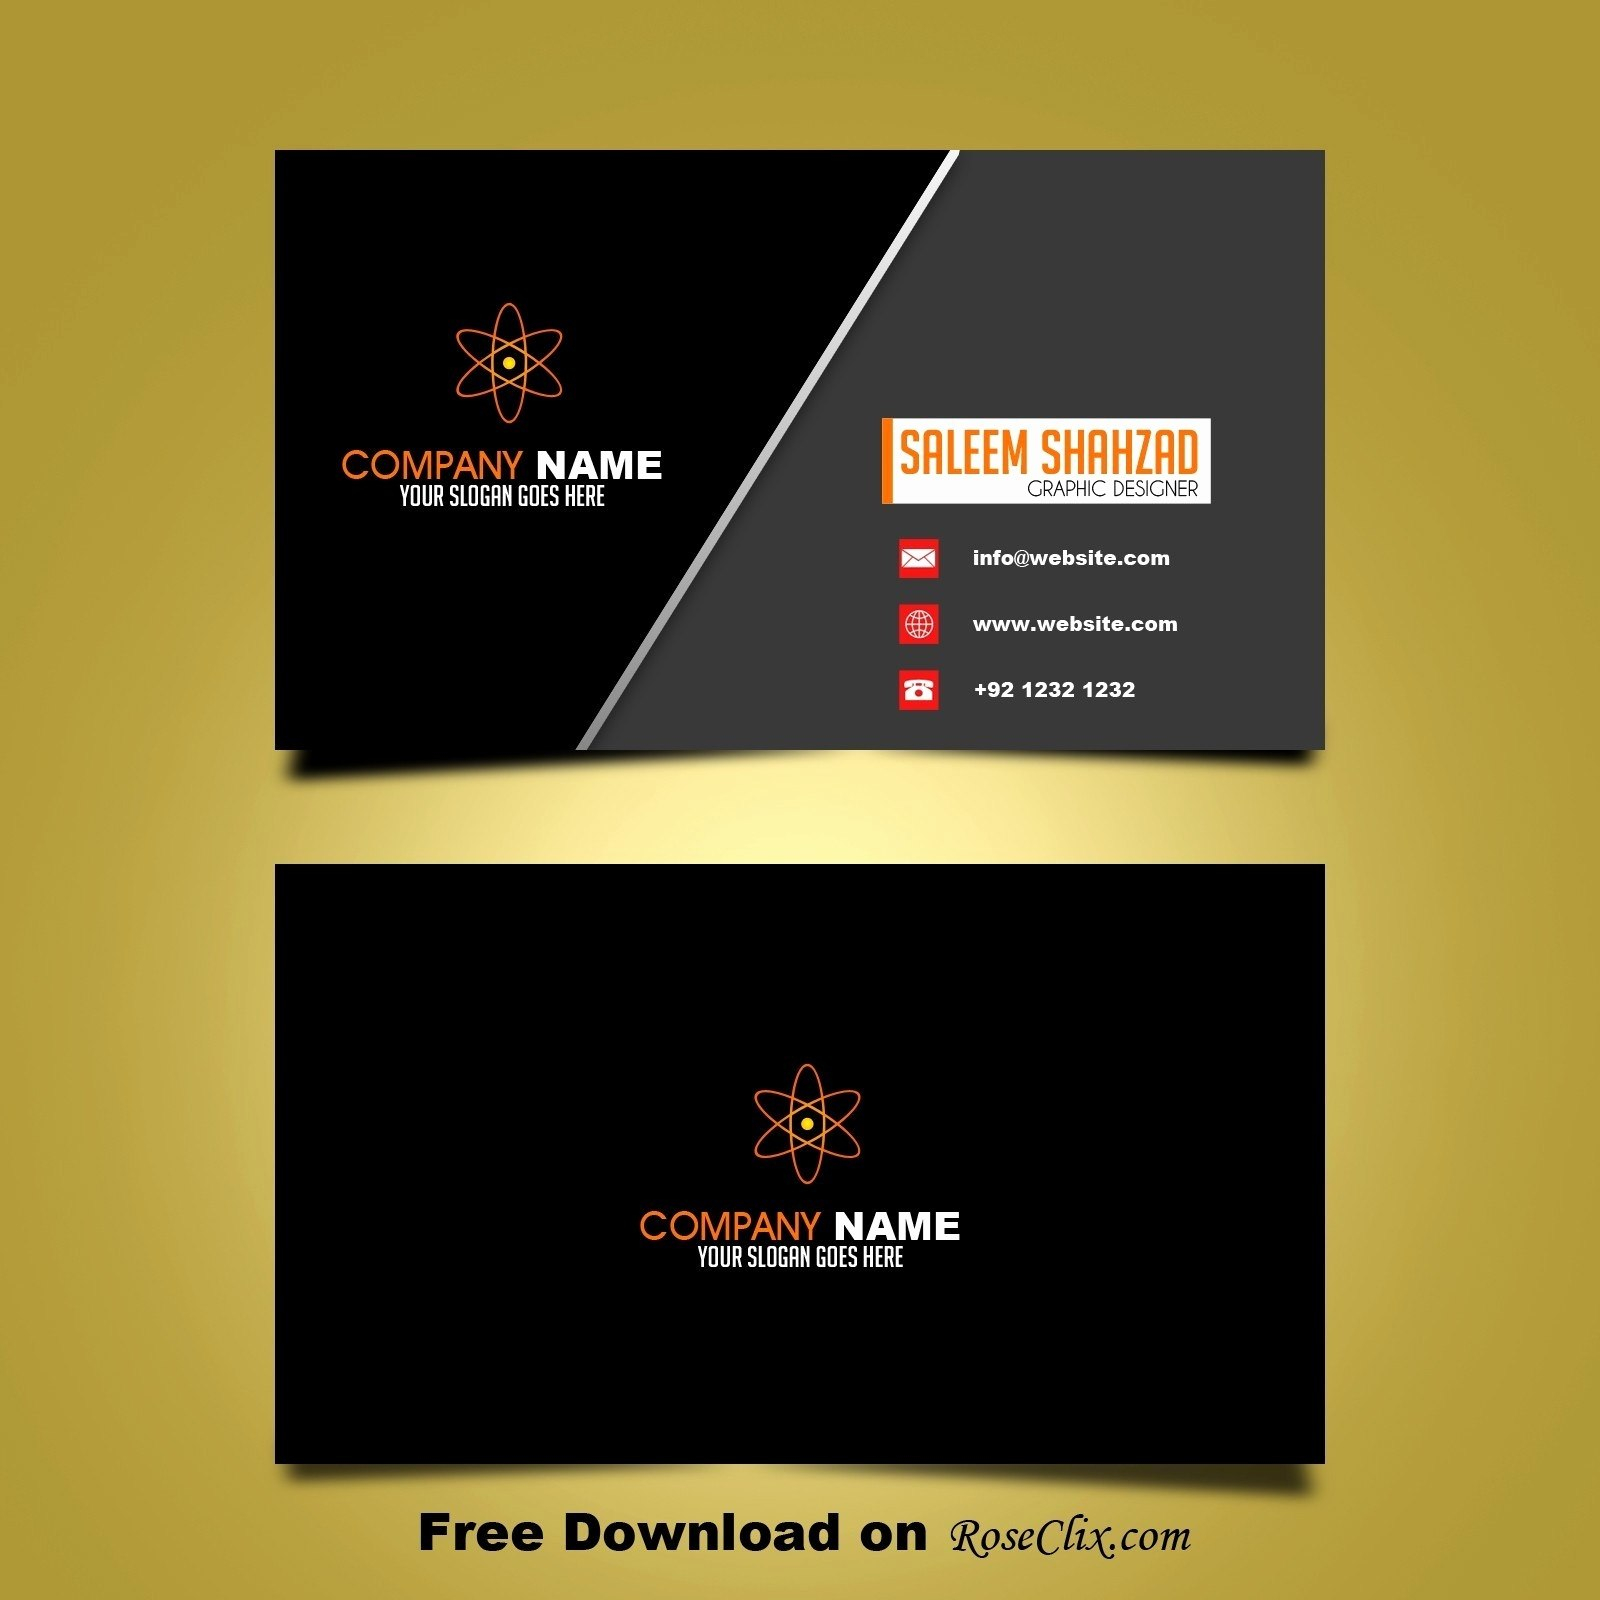 New Photoshop Cs Business Card Template  Hydraexecutives Intended For Photoshop Cs6 Business Card Template